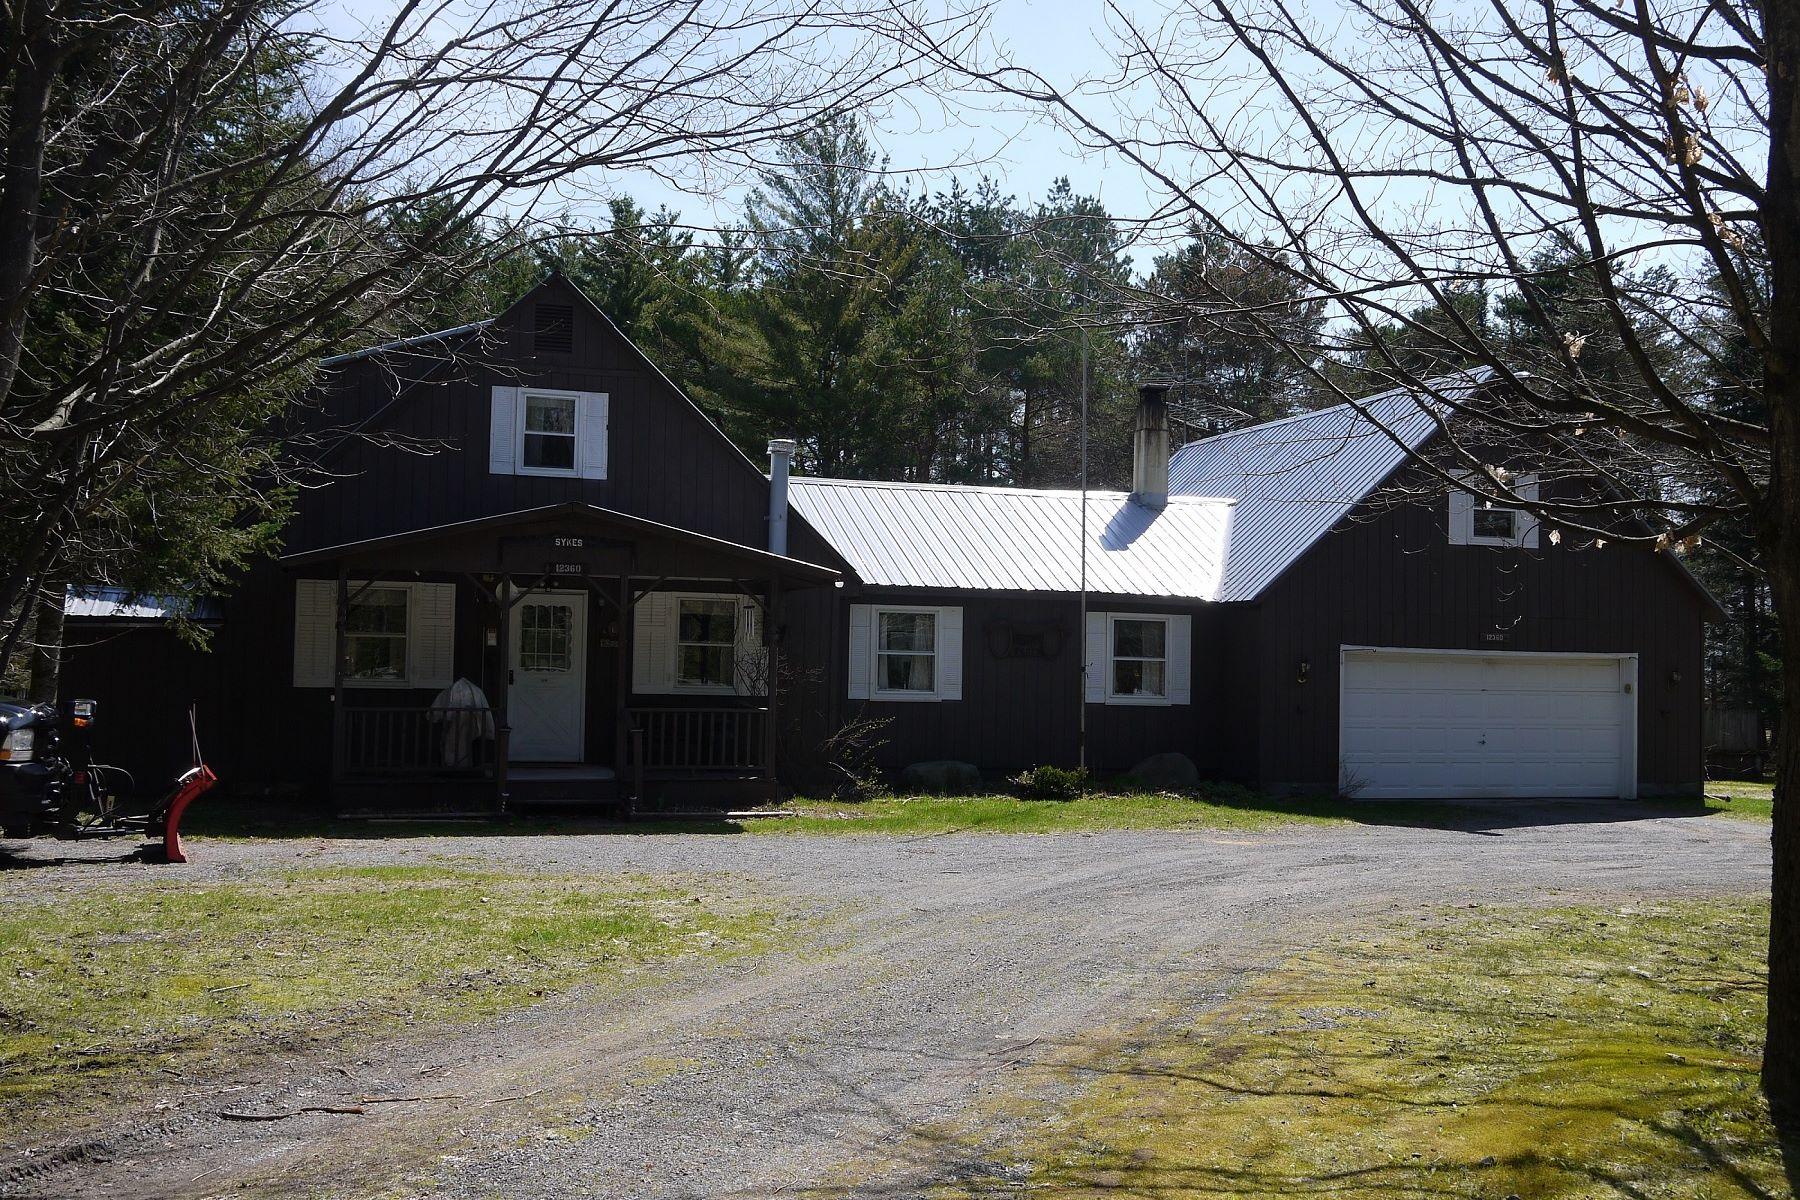 Частный односемейный дом для того Продажа на A growing family's dream home sits right outside the Adirondack Park 12360 NYS Route 28 Woodgate, Нью-Йорк 13494 Соединенные Штаты